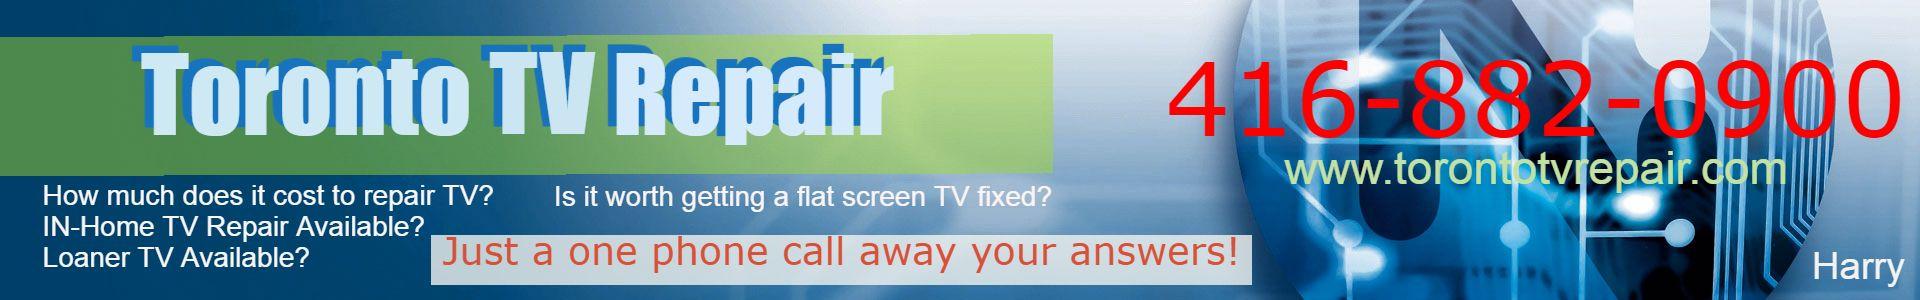 TV Technician - Toronto TV Repair,Television Repair Service